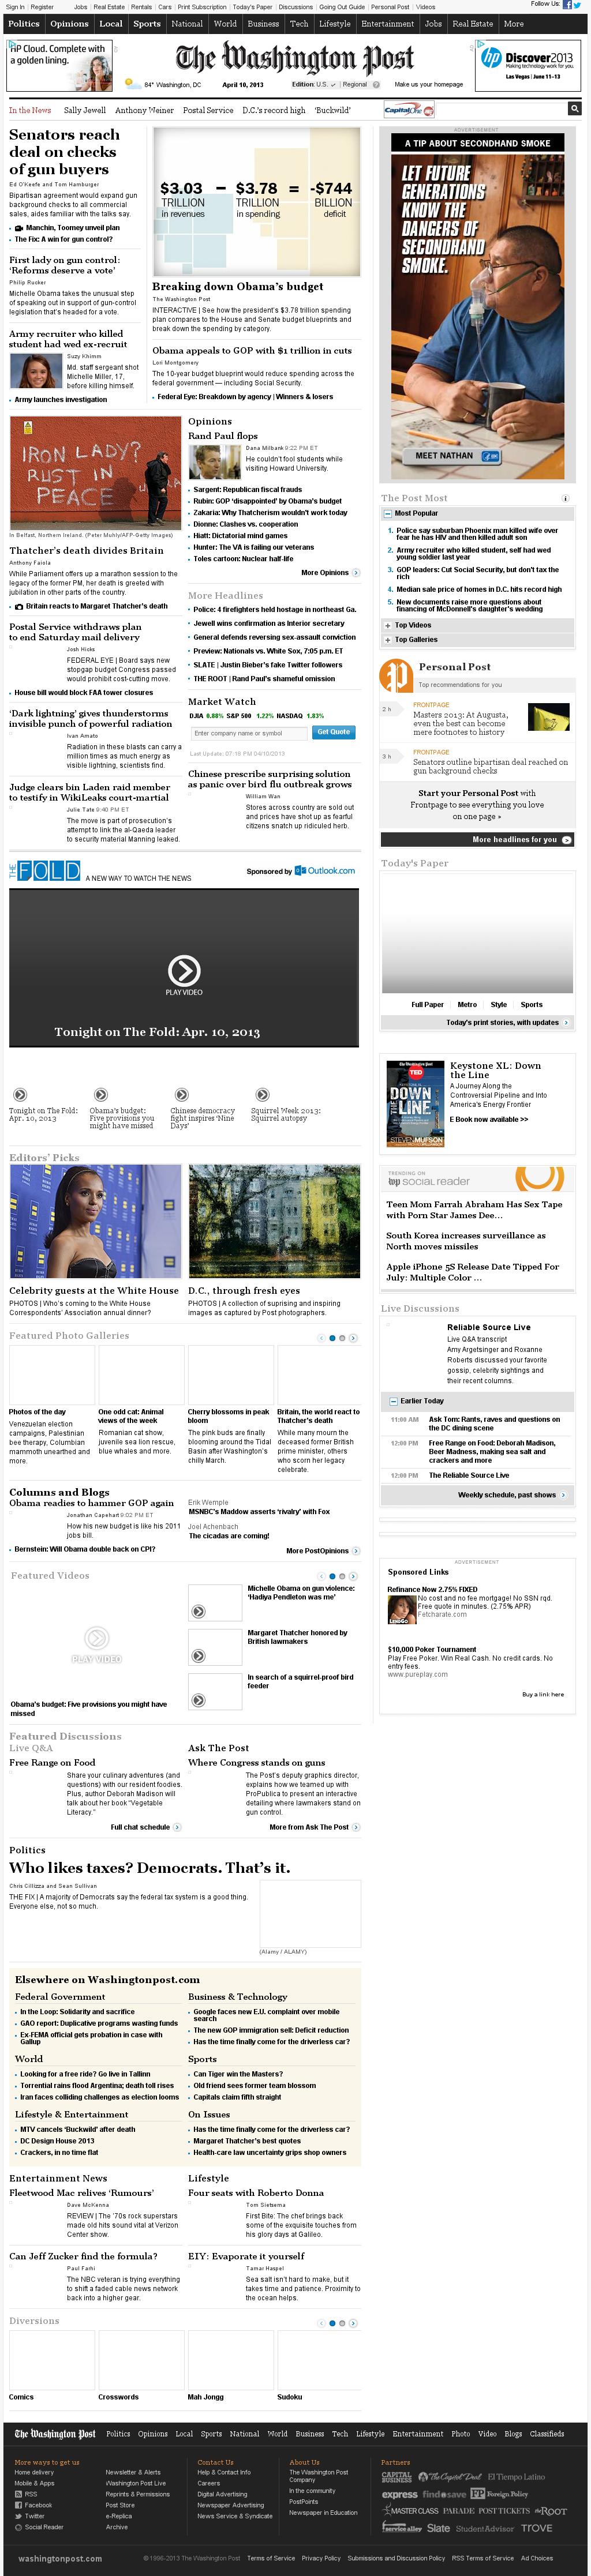 The Washington Post at Wednesday April 10, 2013, 11:28 p.m. UTC